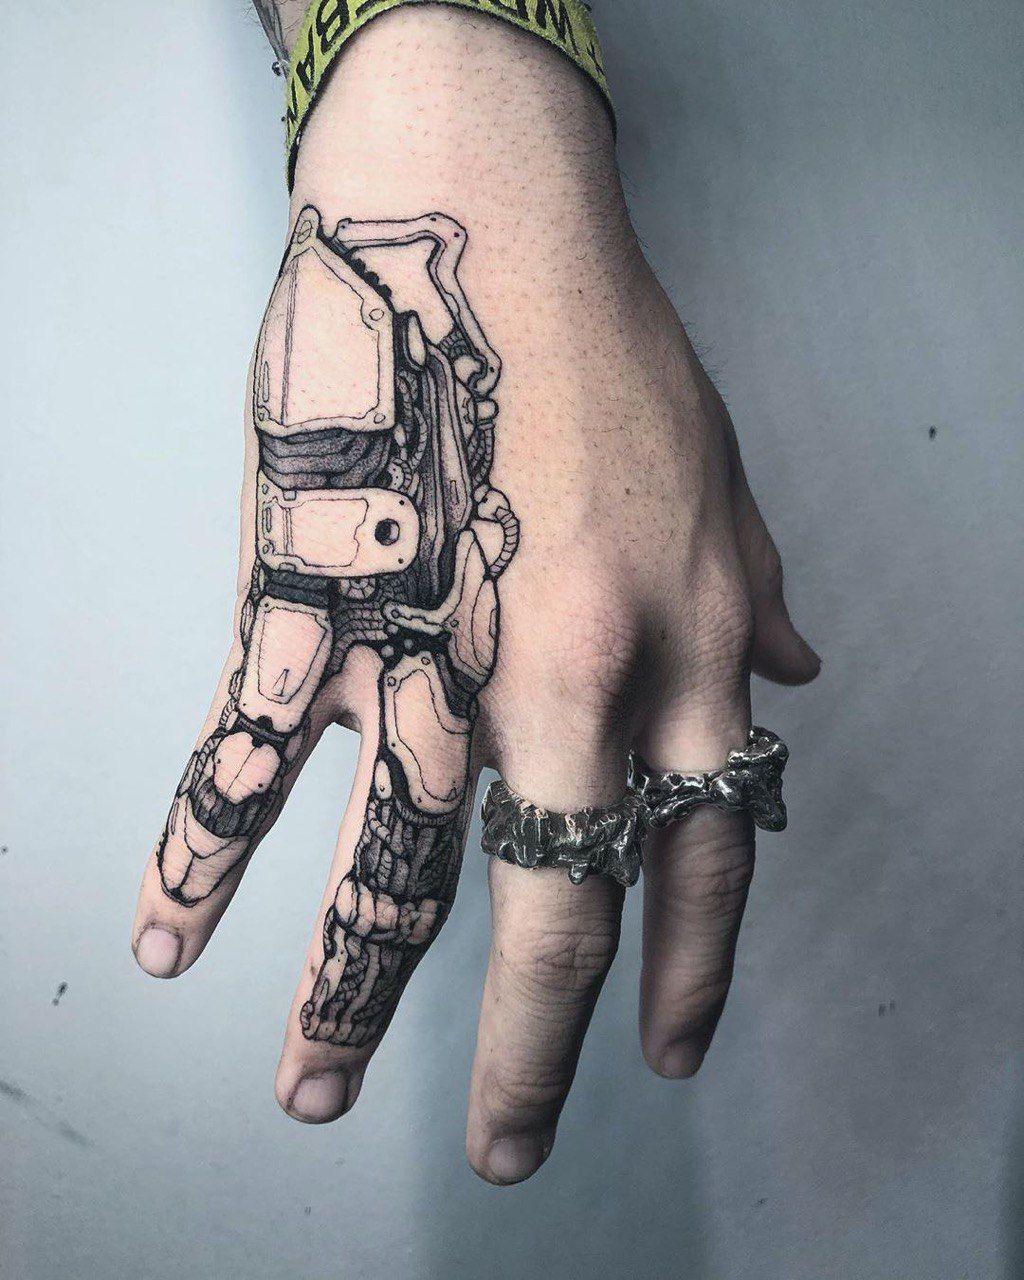 Mechanic Tattoo By Eddie Eddiexbird From Arcadia Usa Ca In 2020 Hand Tattoos For Guys Hand Tattoos Palm Tattoos